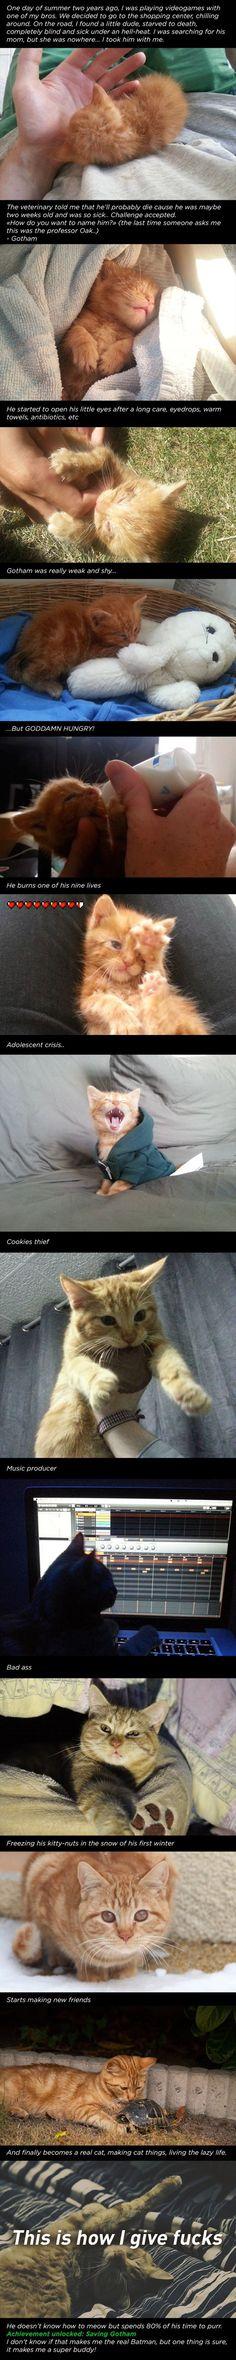 Story of a Cat named Gotham - Imgur